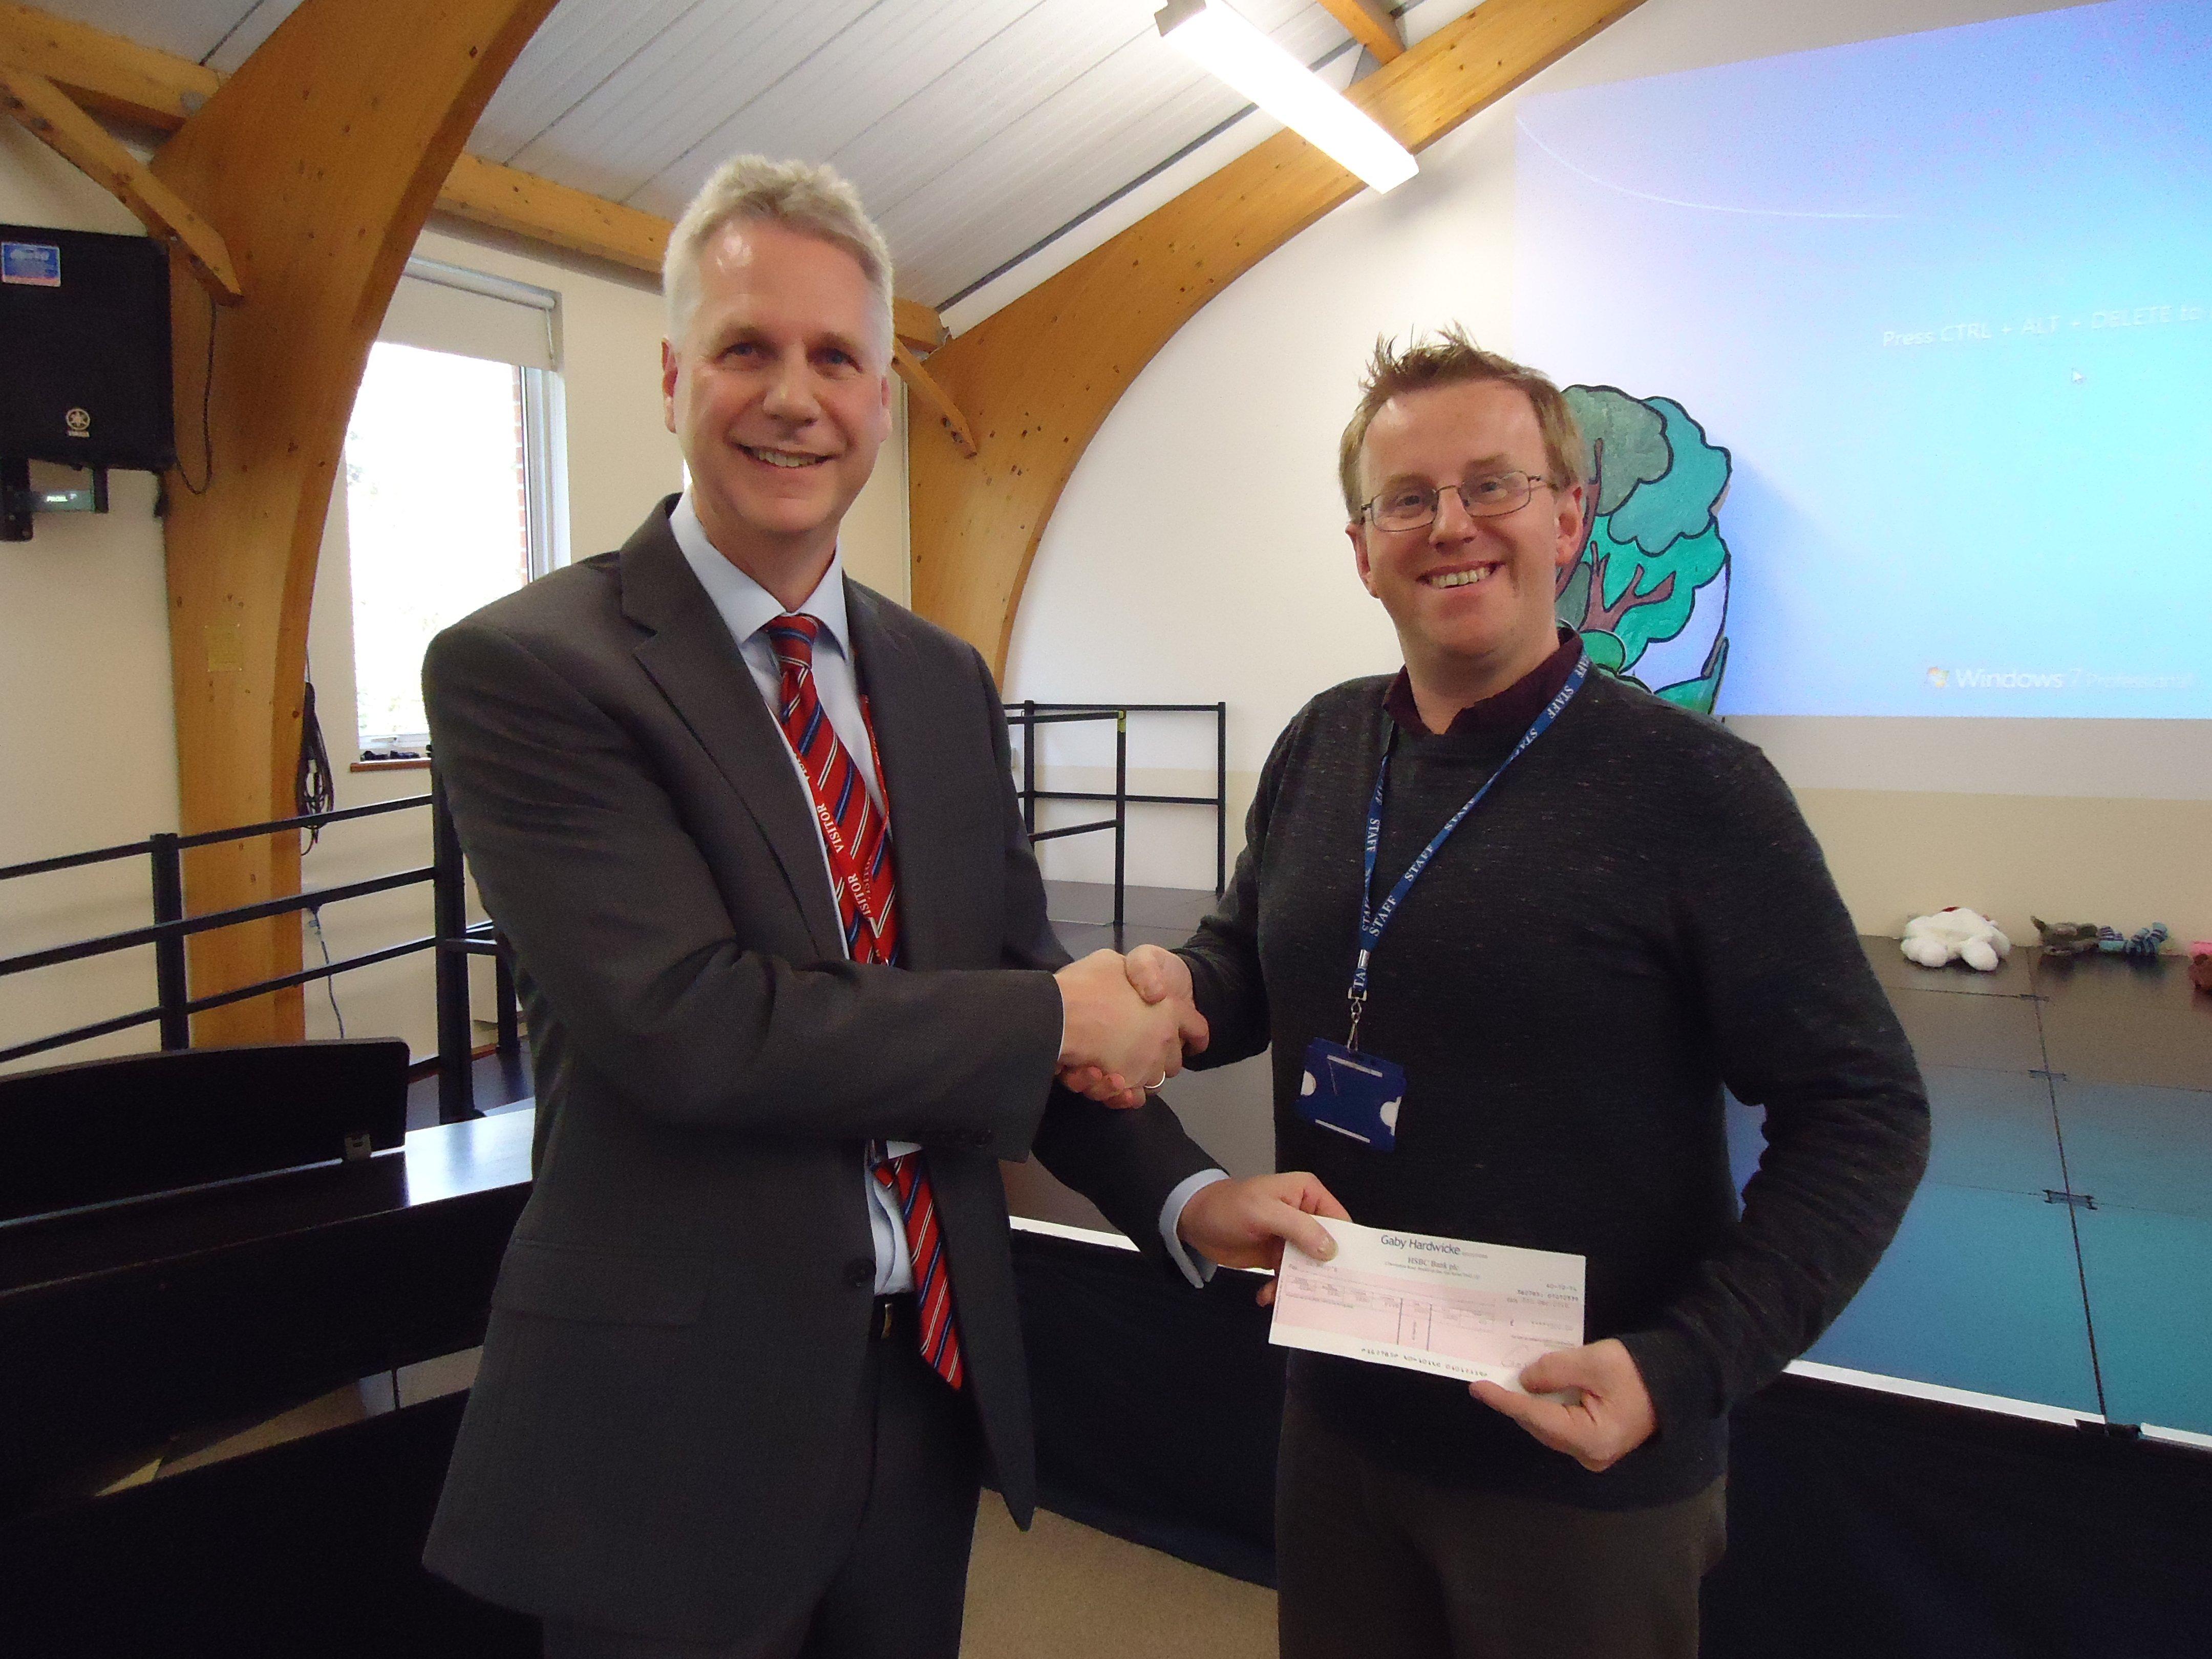 David Young with Jonathan Smalldon (Fundraising Manager)